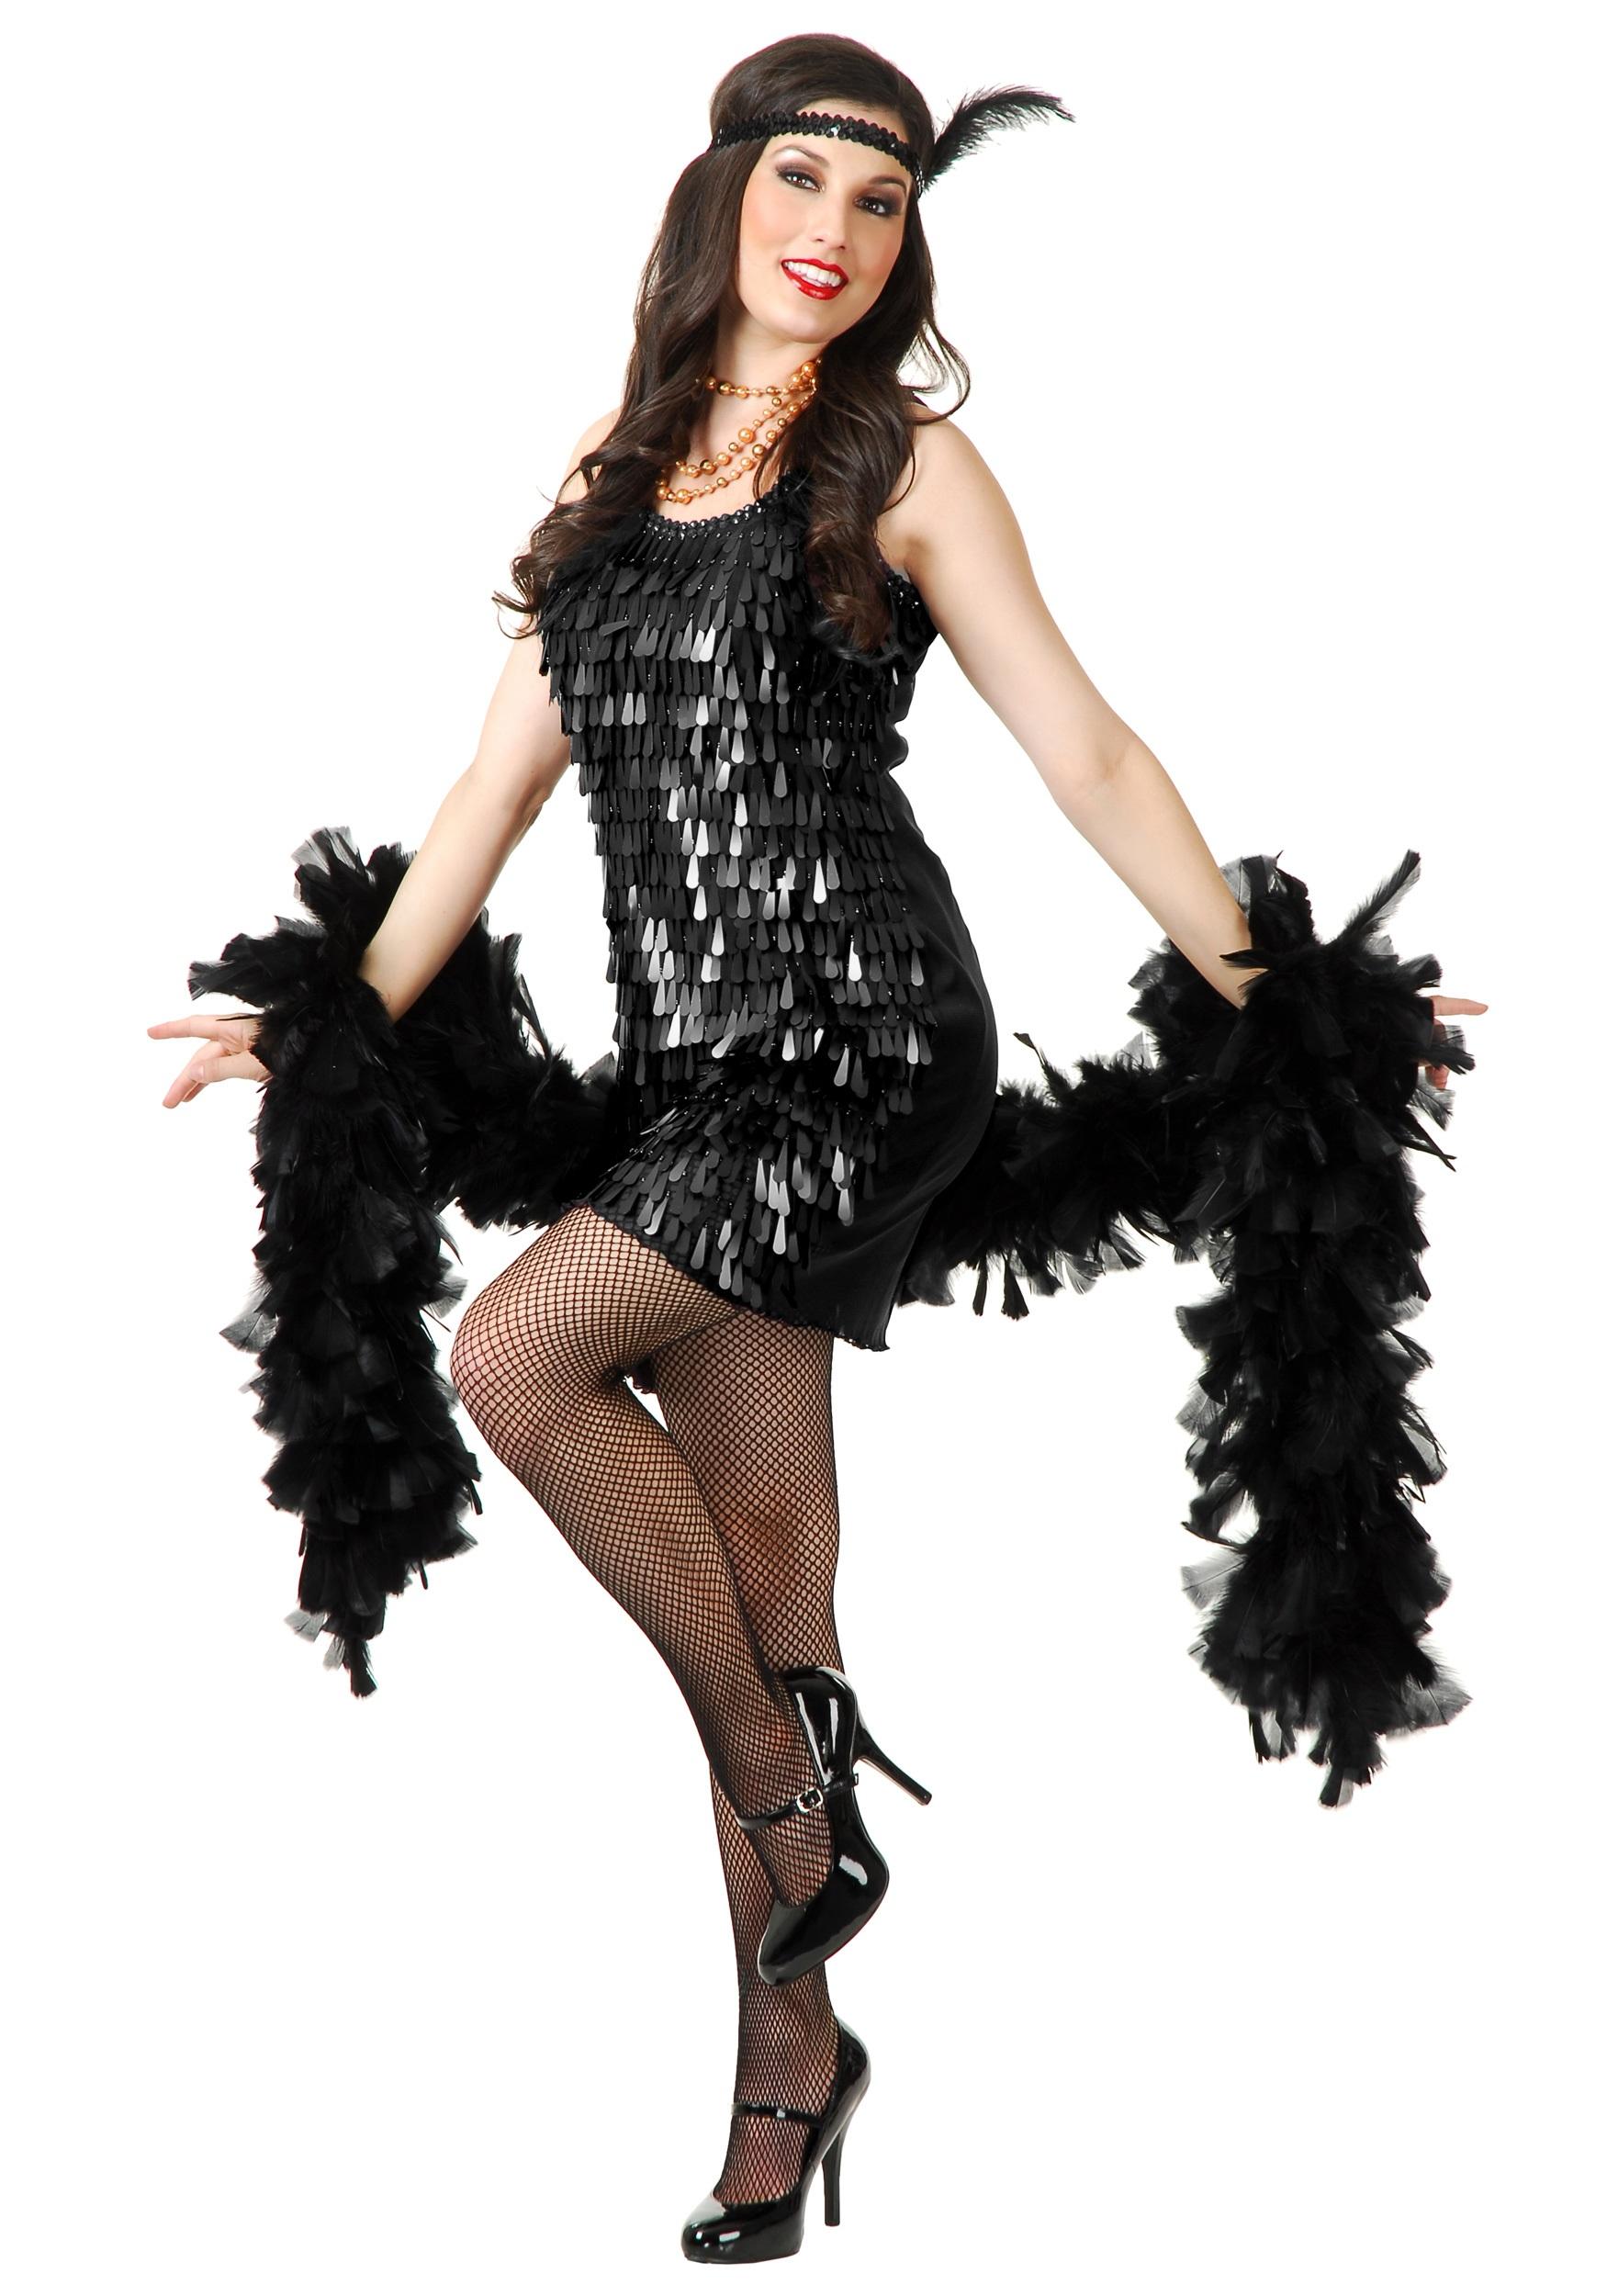 08be501155e8 Black Tear Drop Flapper Costume - Retro 20s Costumes for Women